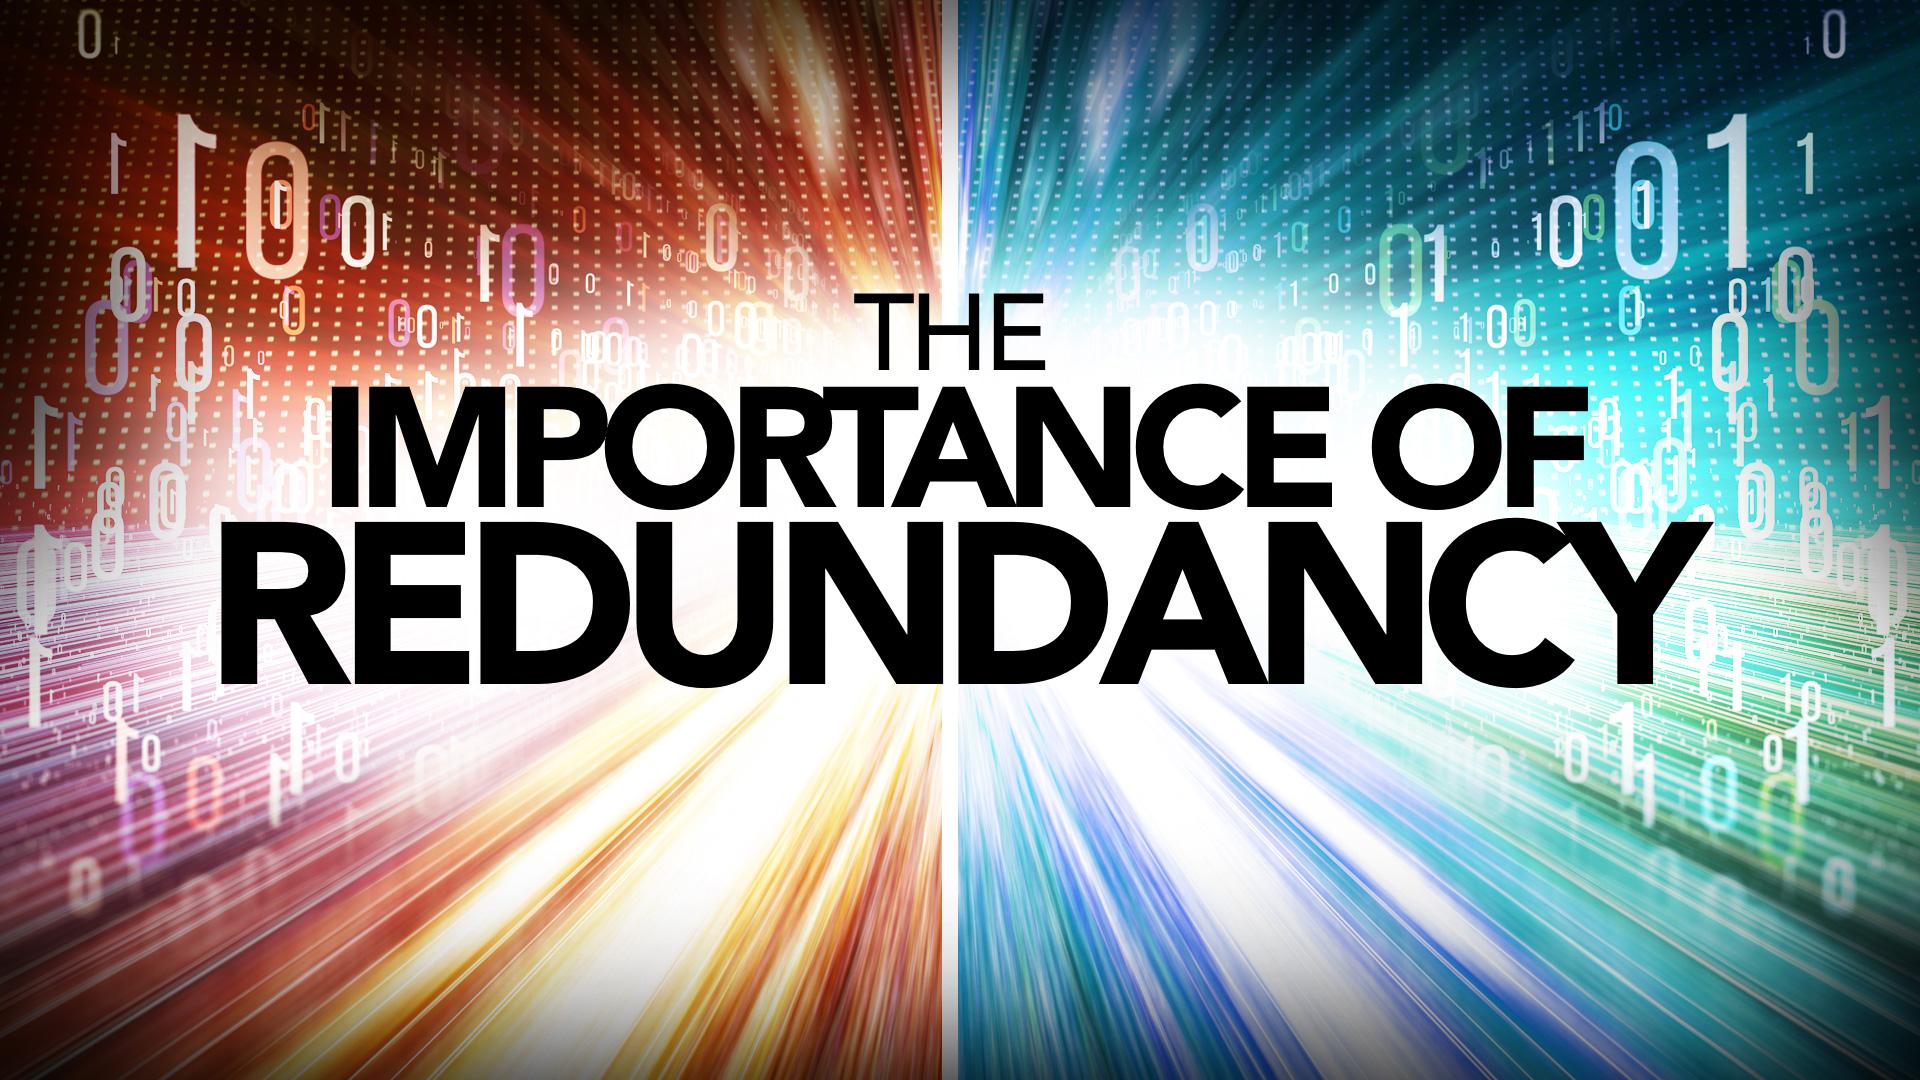 The Importance of Redundancy